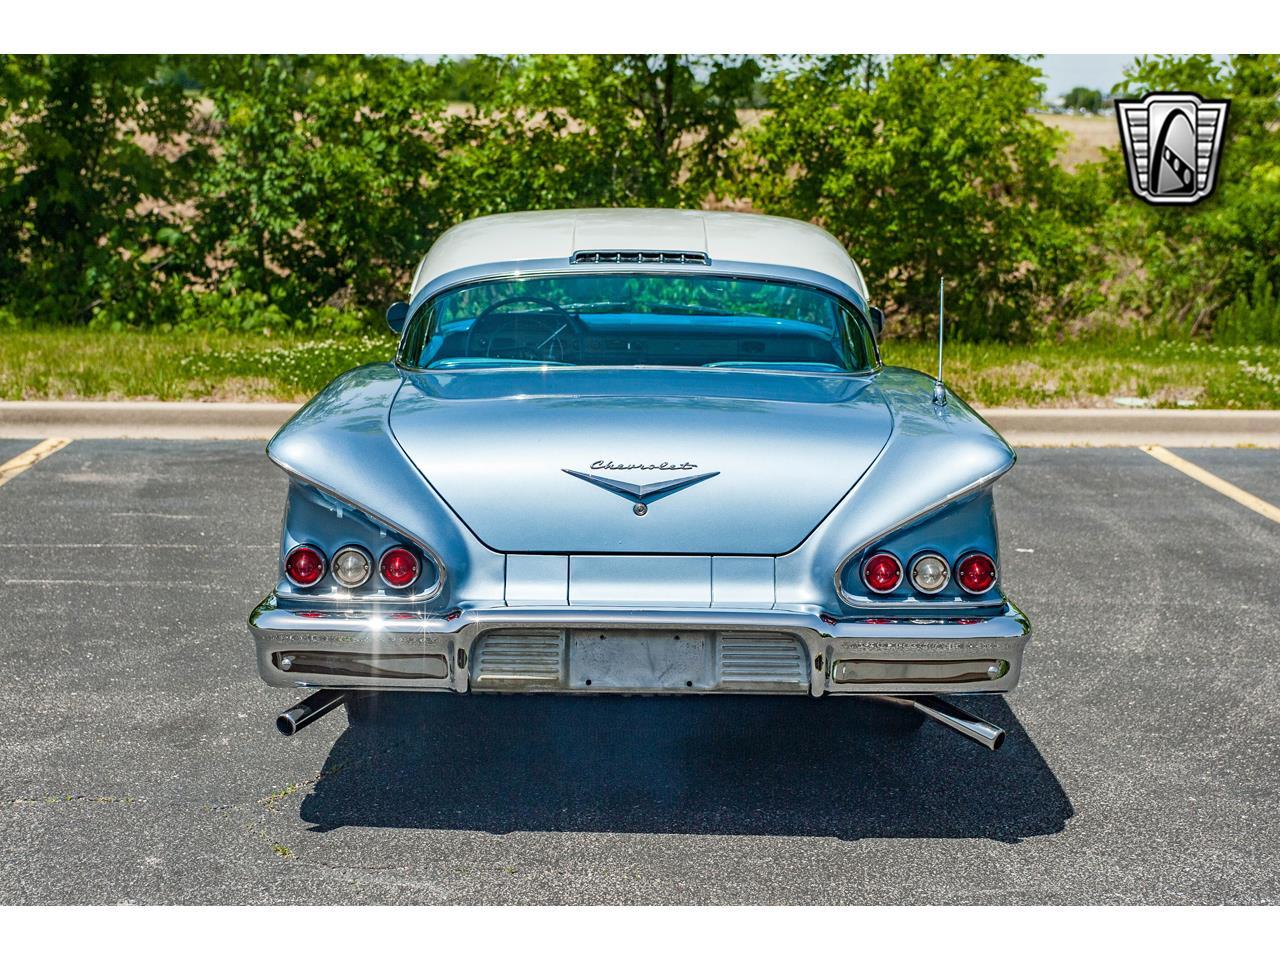 Large Picture of 1958 Impala - $62,000.00 - QB9Q